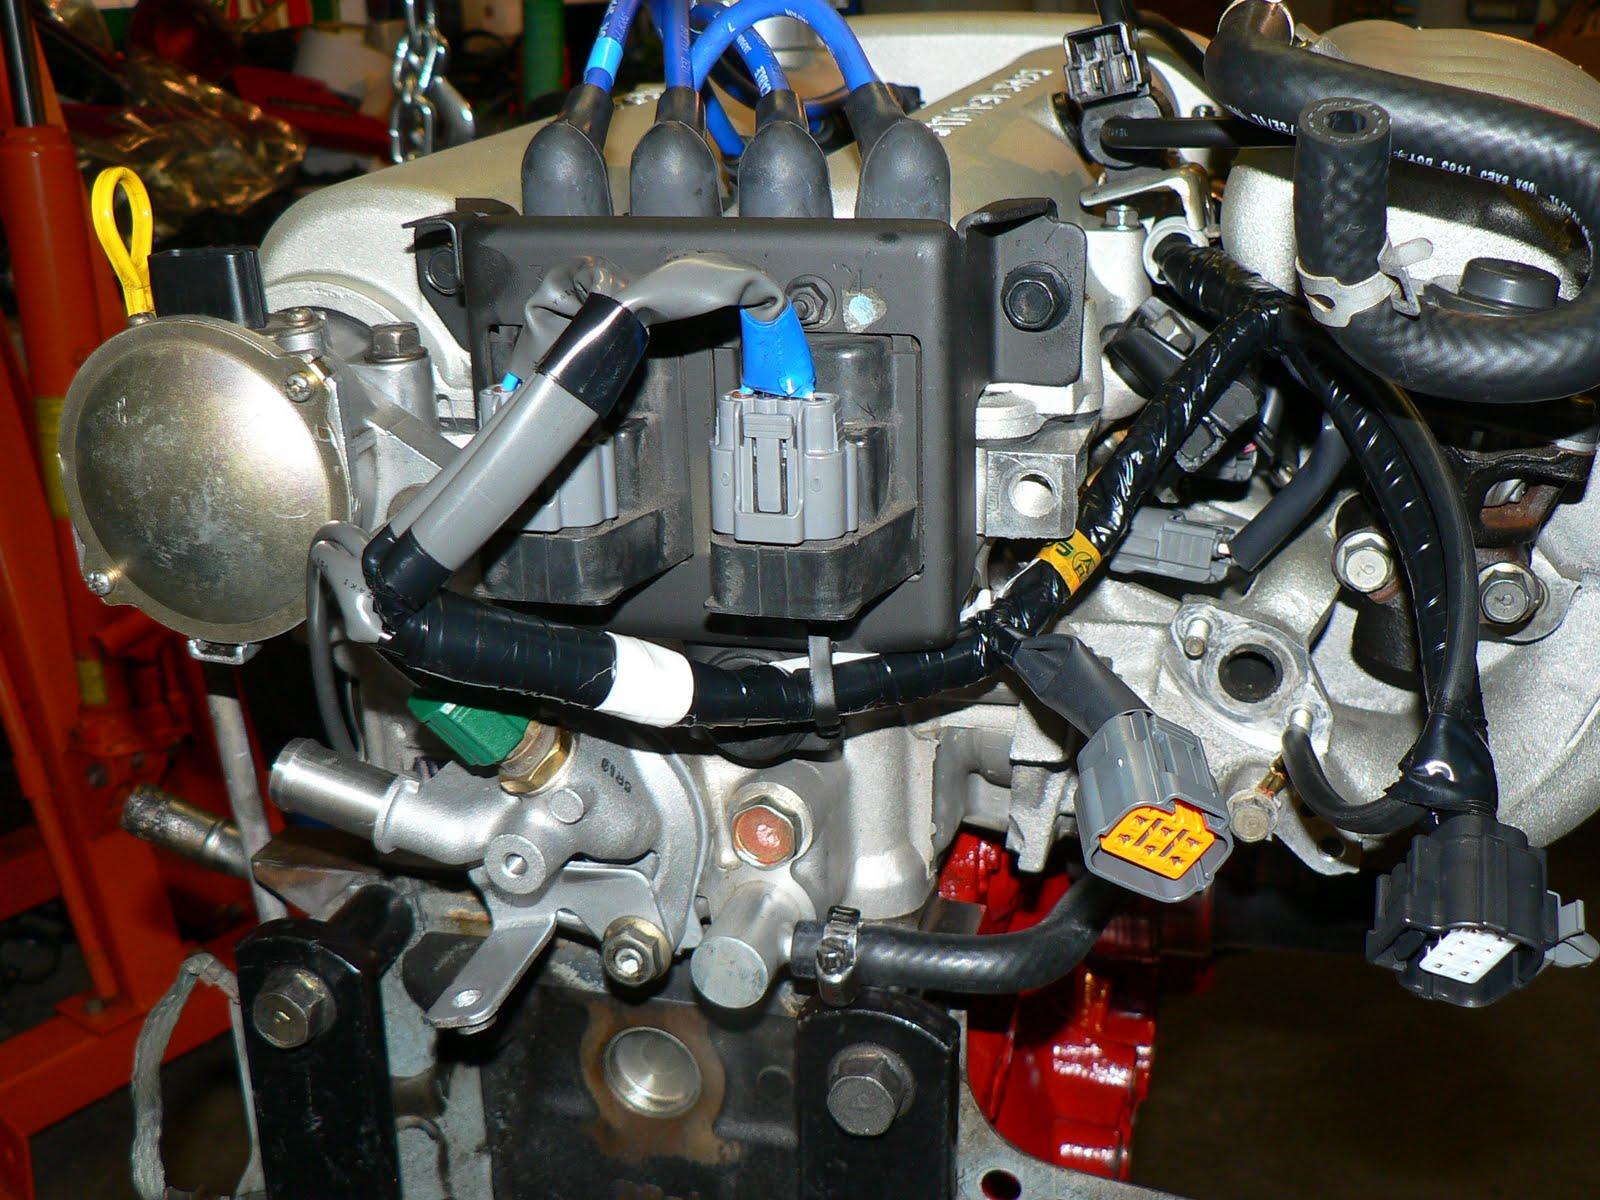 miata engine plastic skirt diagram smart wiring diagrams u2022 92 miata fuse box diagram na [ 1600 x 1200 Pixel ]